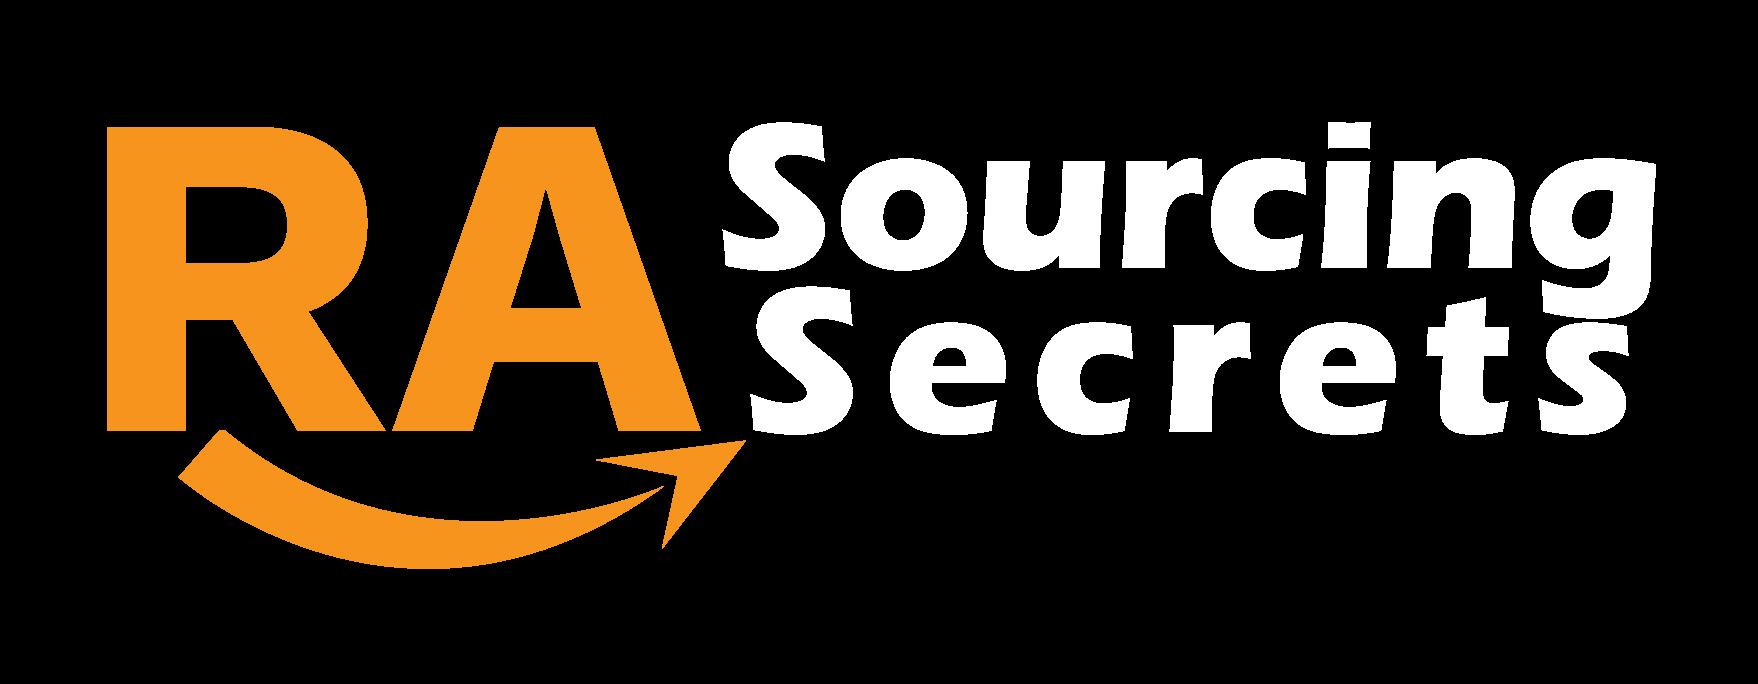 RA Sourcing Secrets